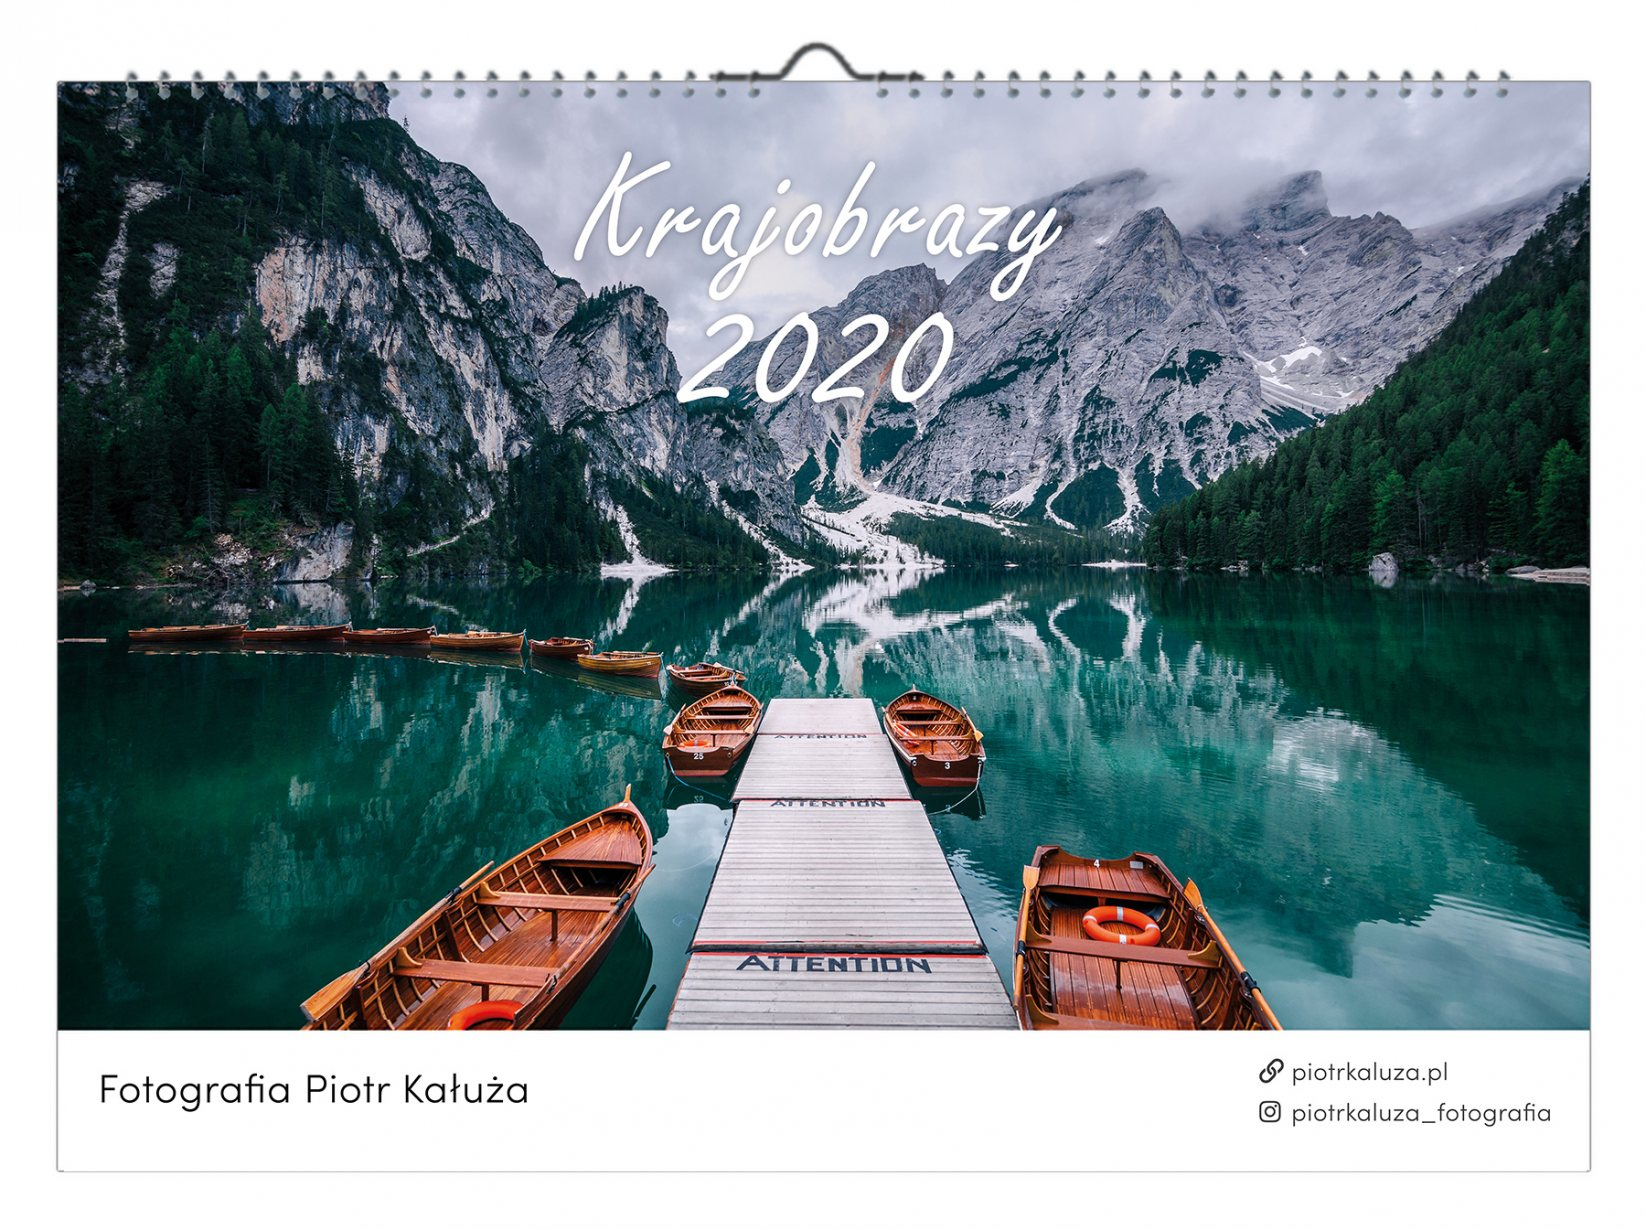 Kalendarz krajobrazy 2020 - Piotr Kałuża